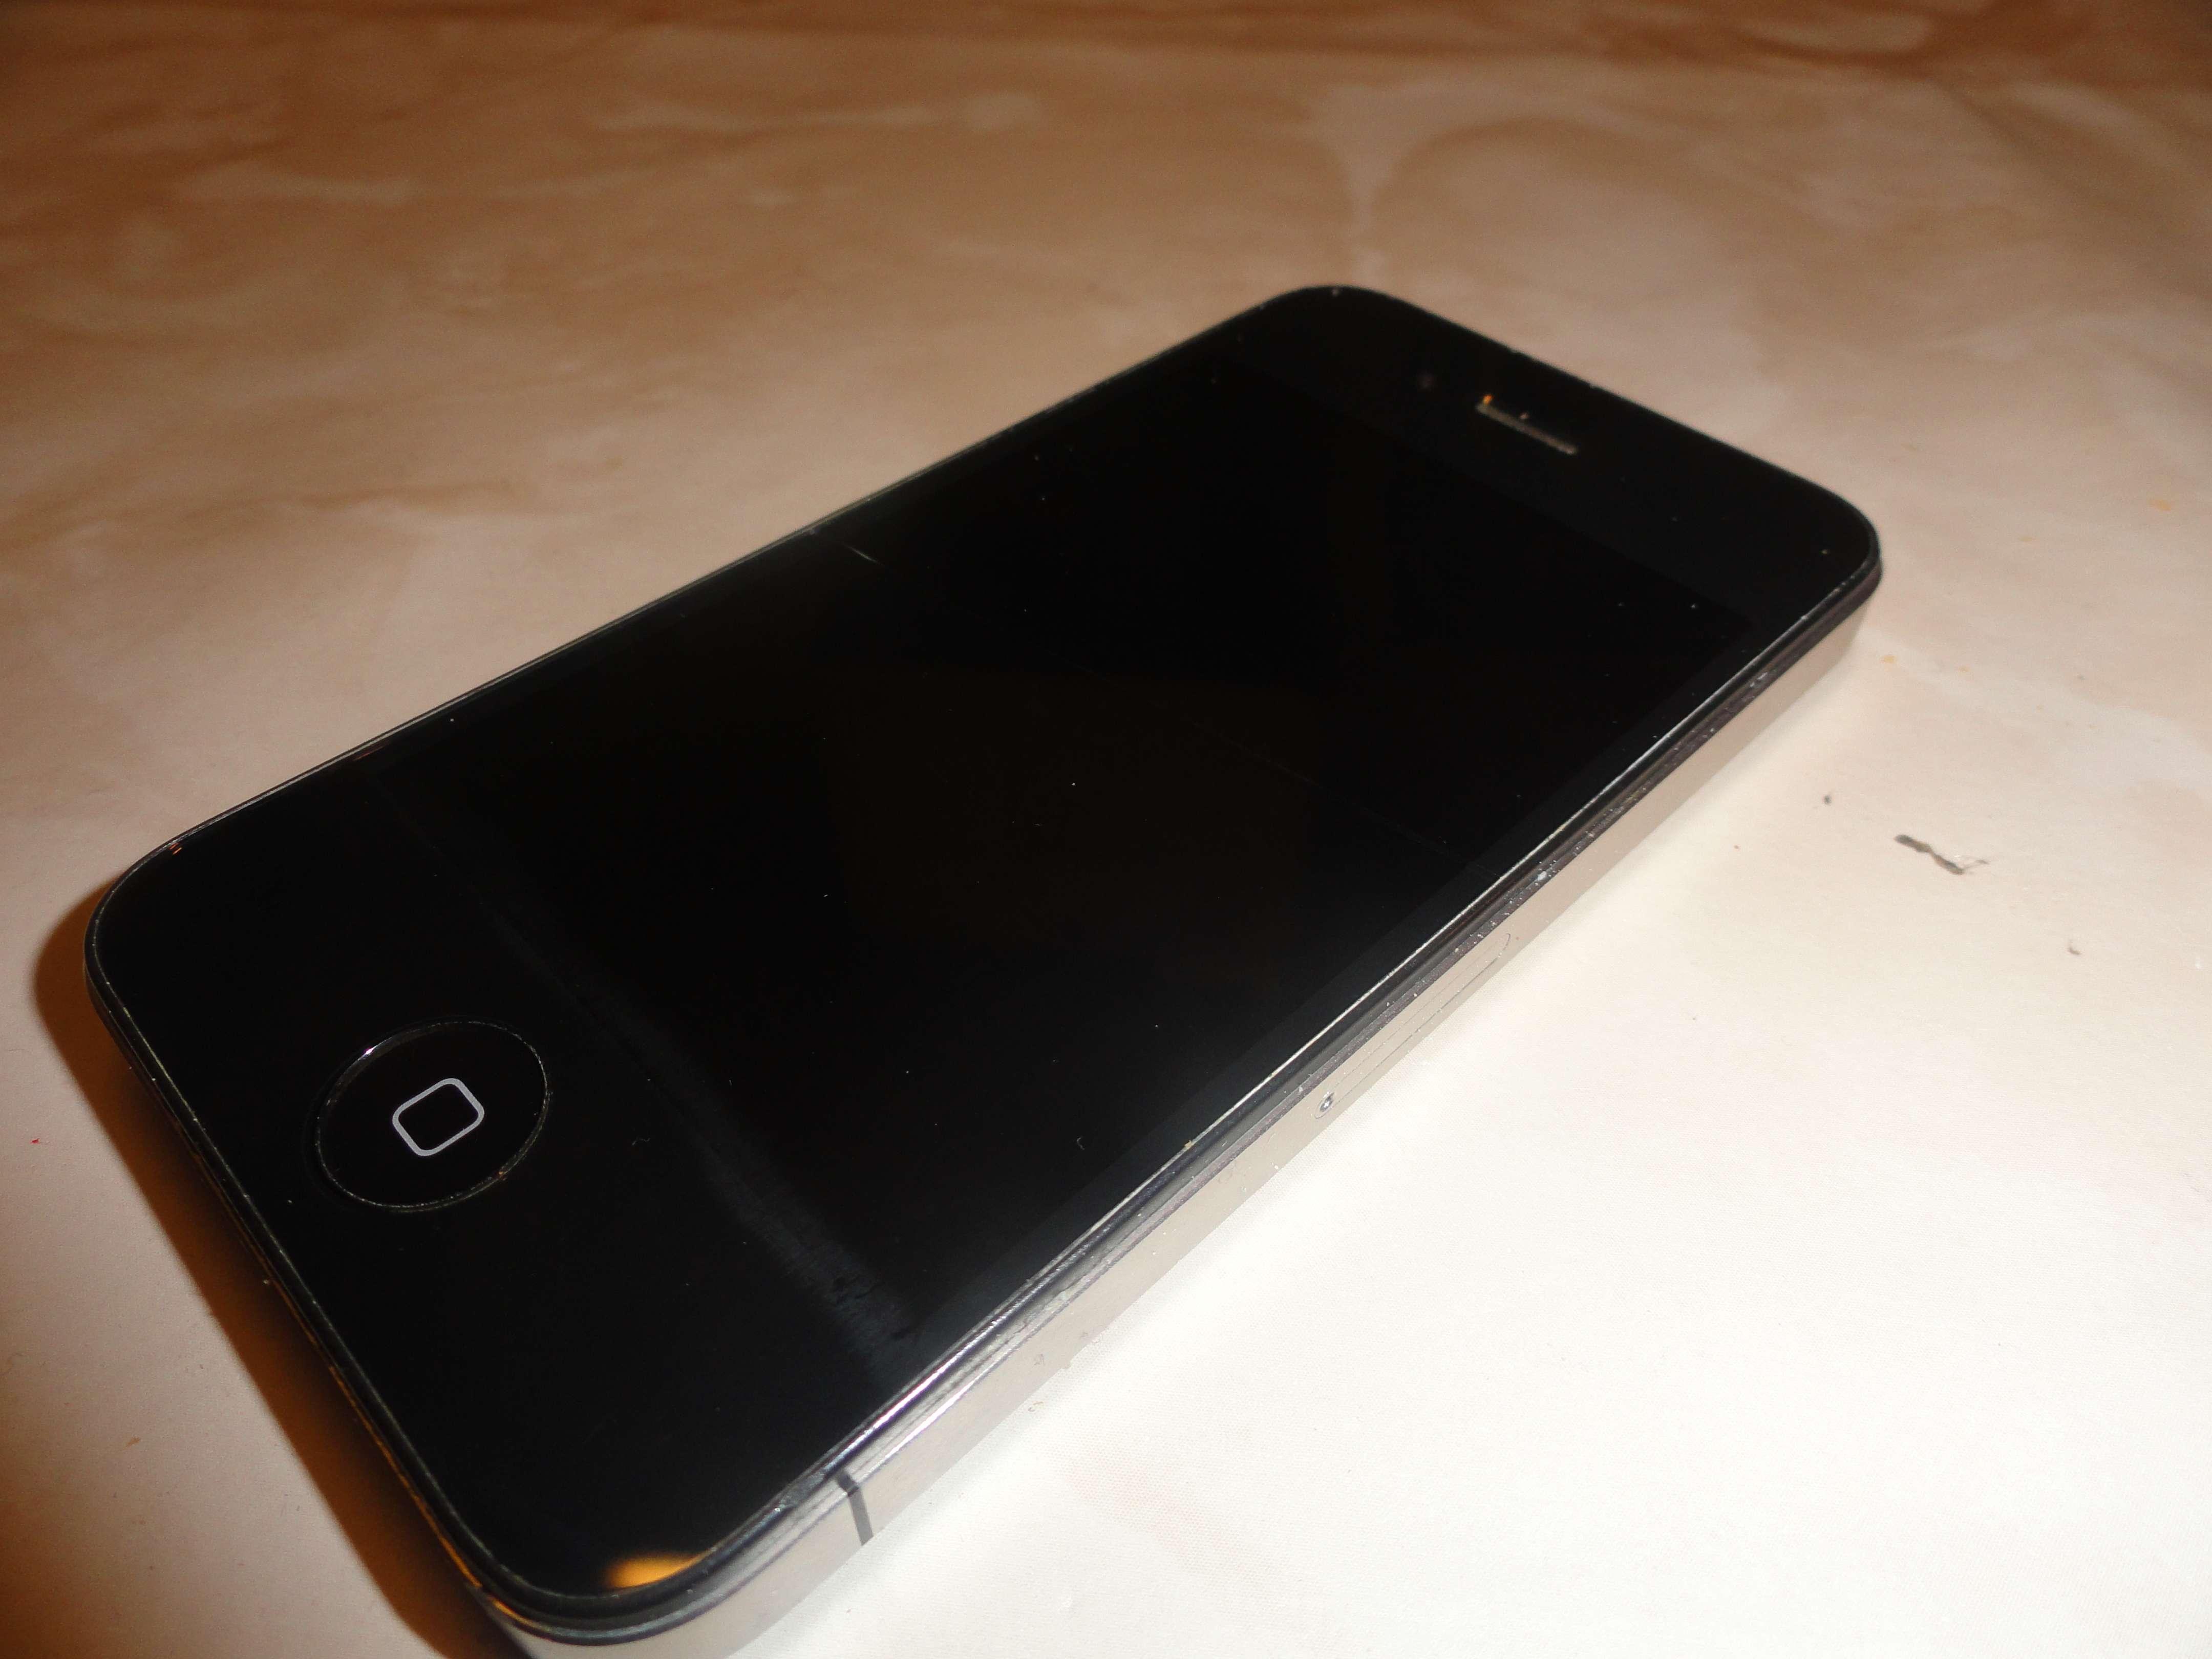 apple iphone 4 16gb schwarz ohne simlock sprung im. Black Bedroom Furniture Sets. Home Design Ideas